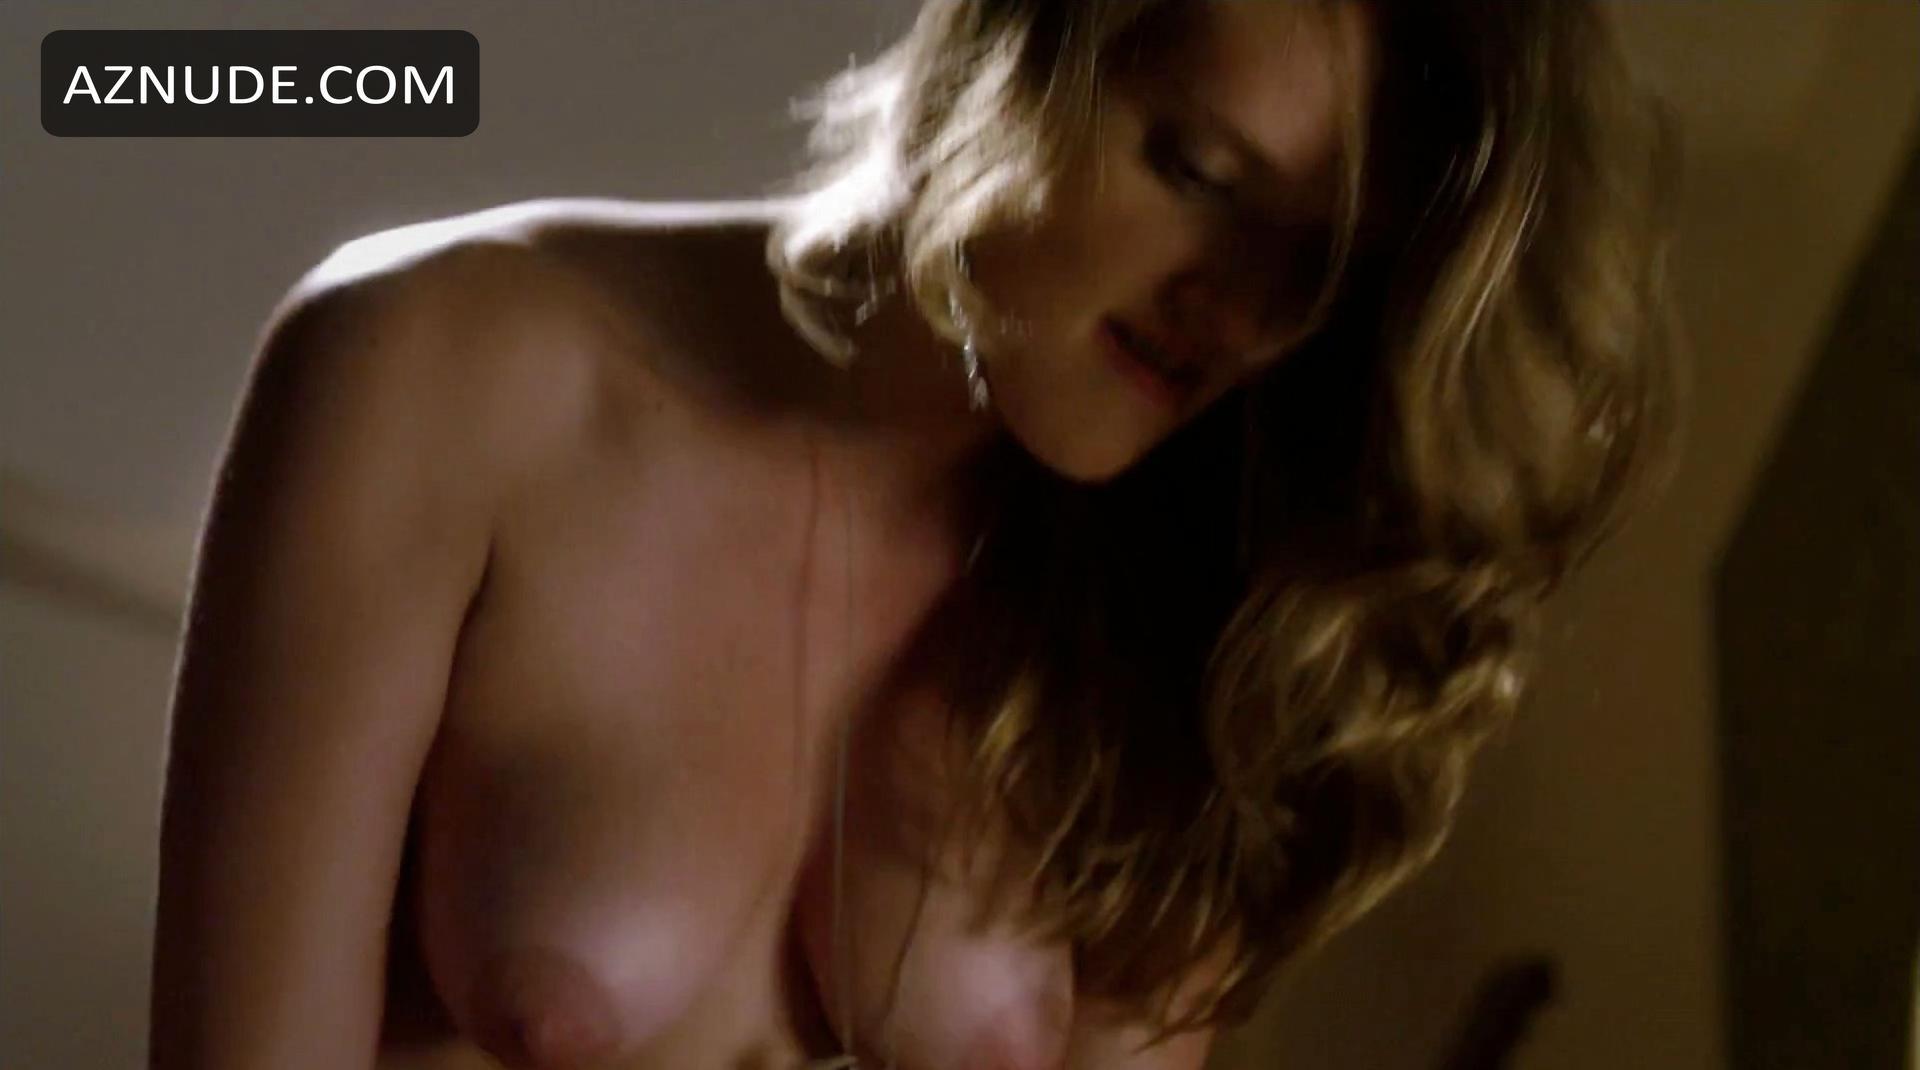 Bikini model academy 2015 mindy robinson - 2 part 2